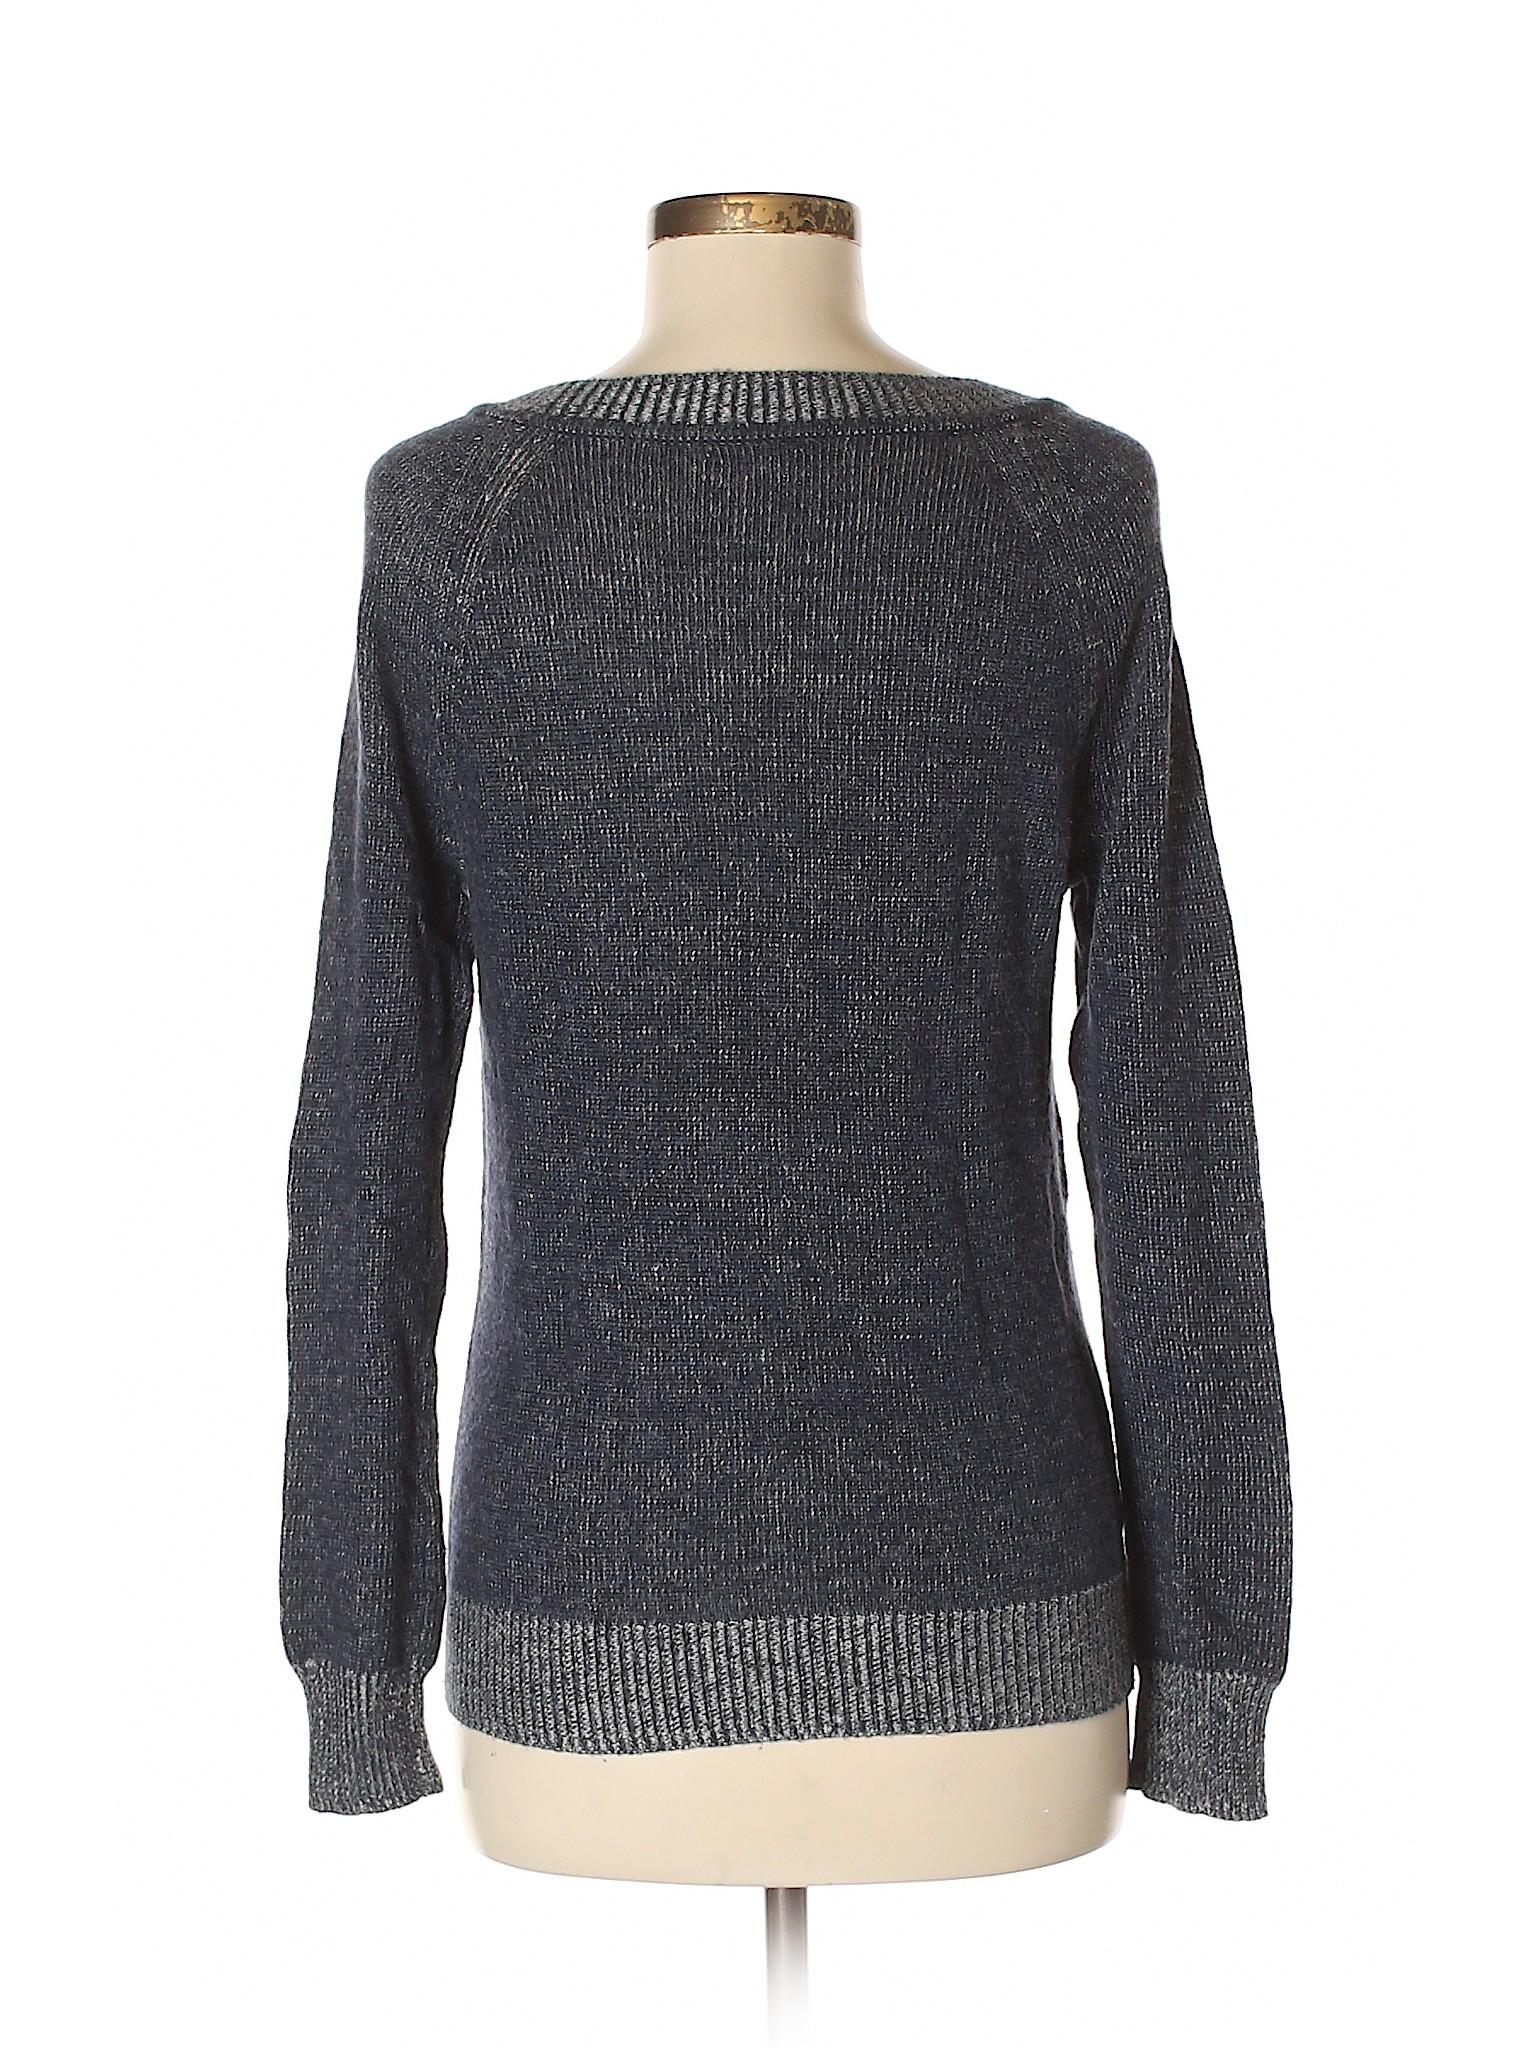 Boutique Pullover Sweater Gap Pullover Boutique Gap Sweater Boutique Gap Sweater Gap Boutique Pullover Pwdwxq